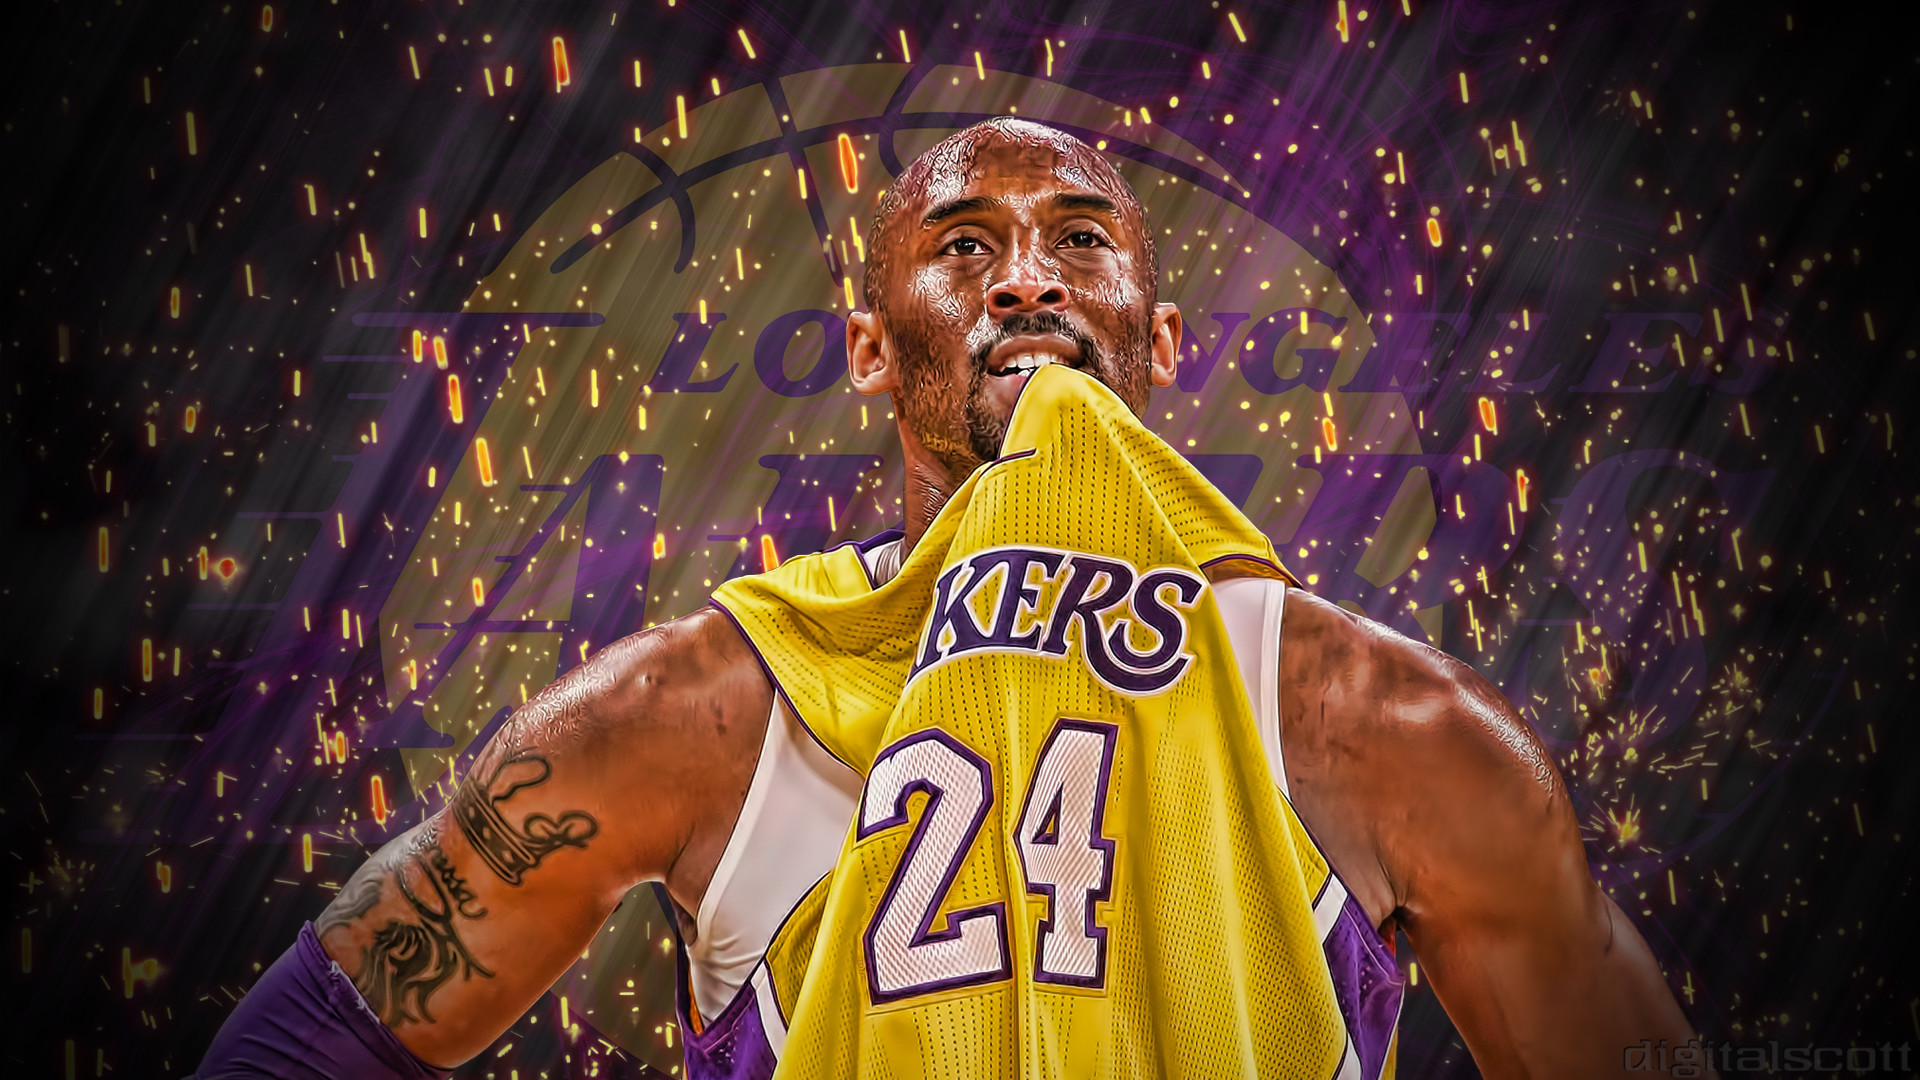 Kobe bryant dunk wallpaper 70 images - Kobe bryant wallpaper free download ...